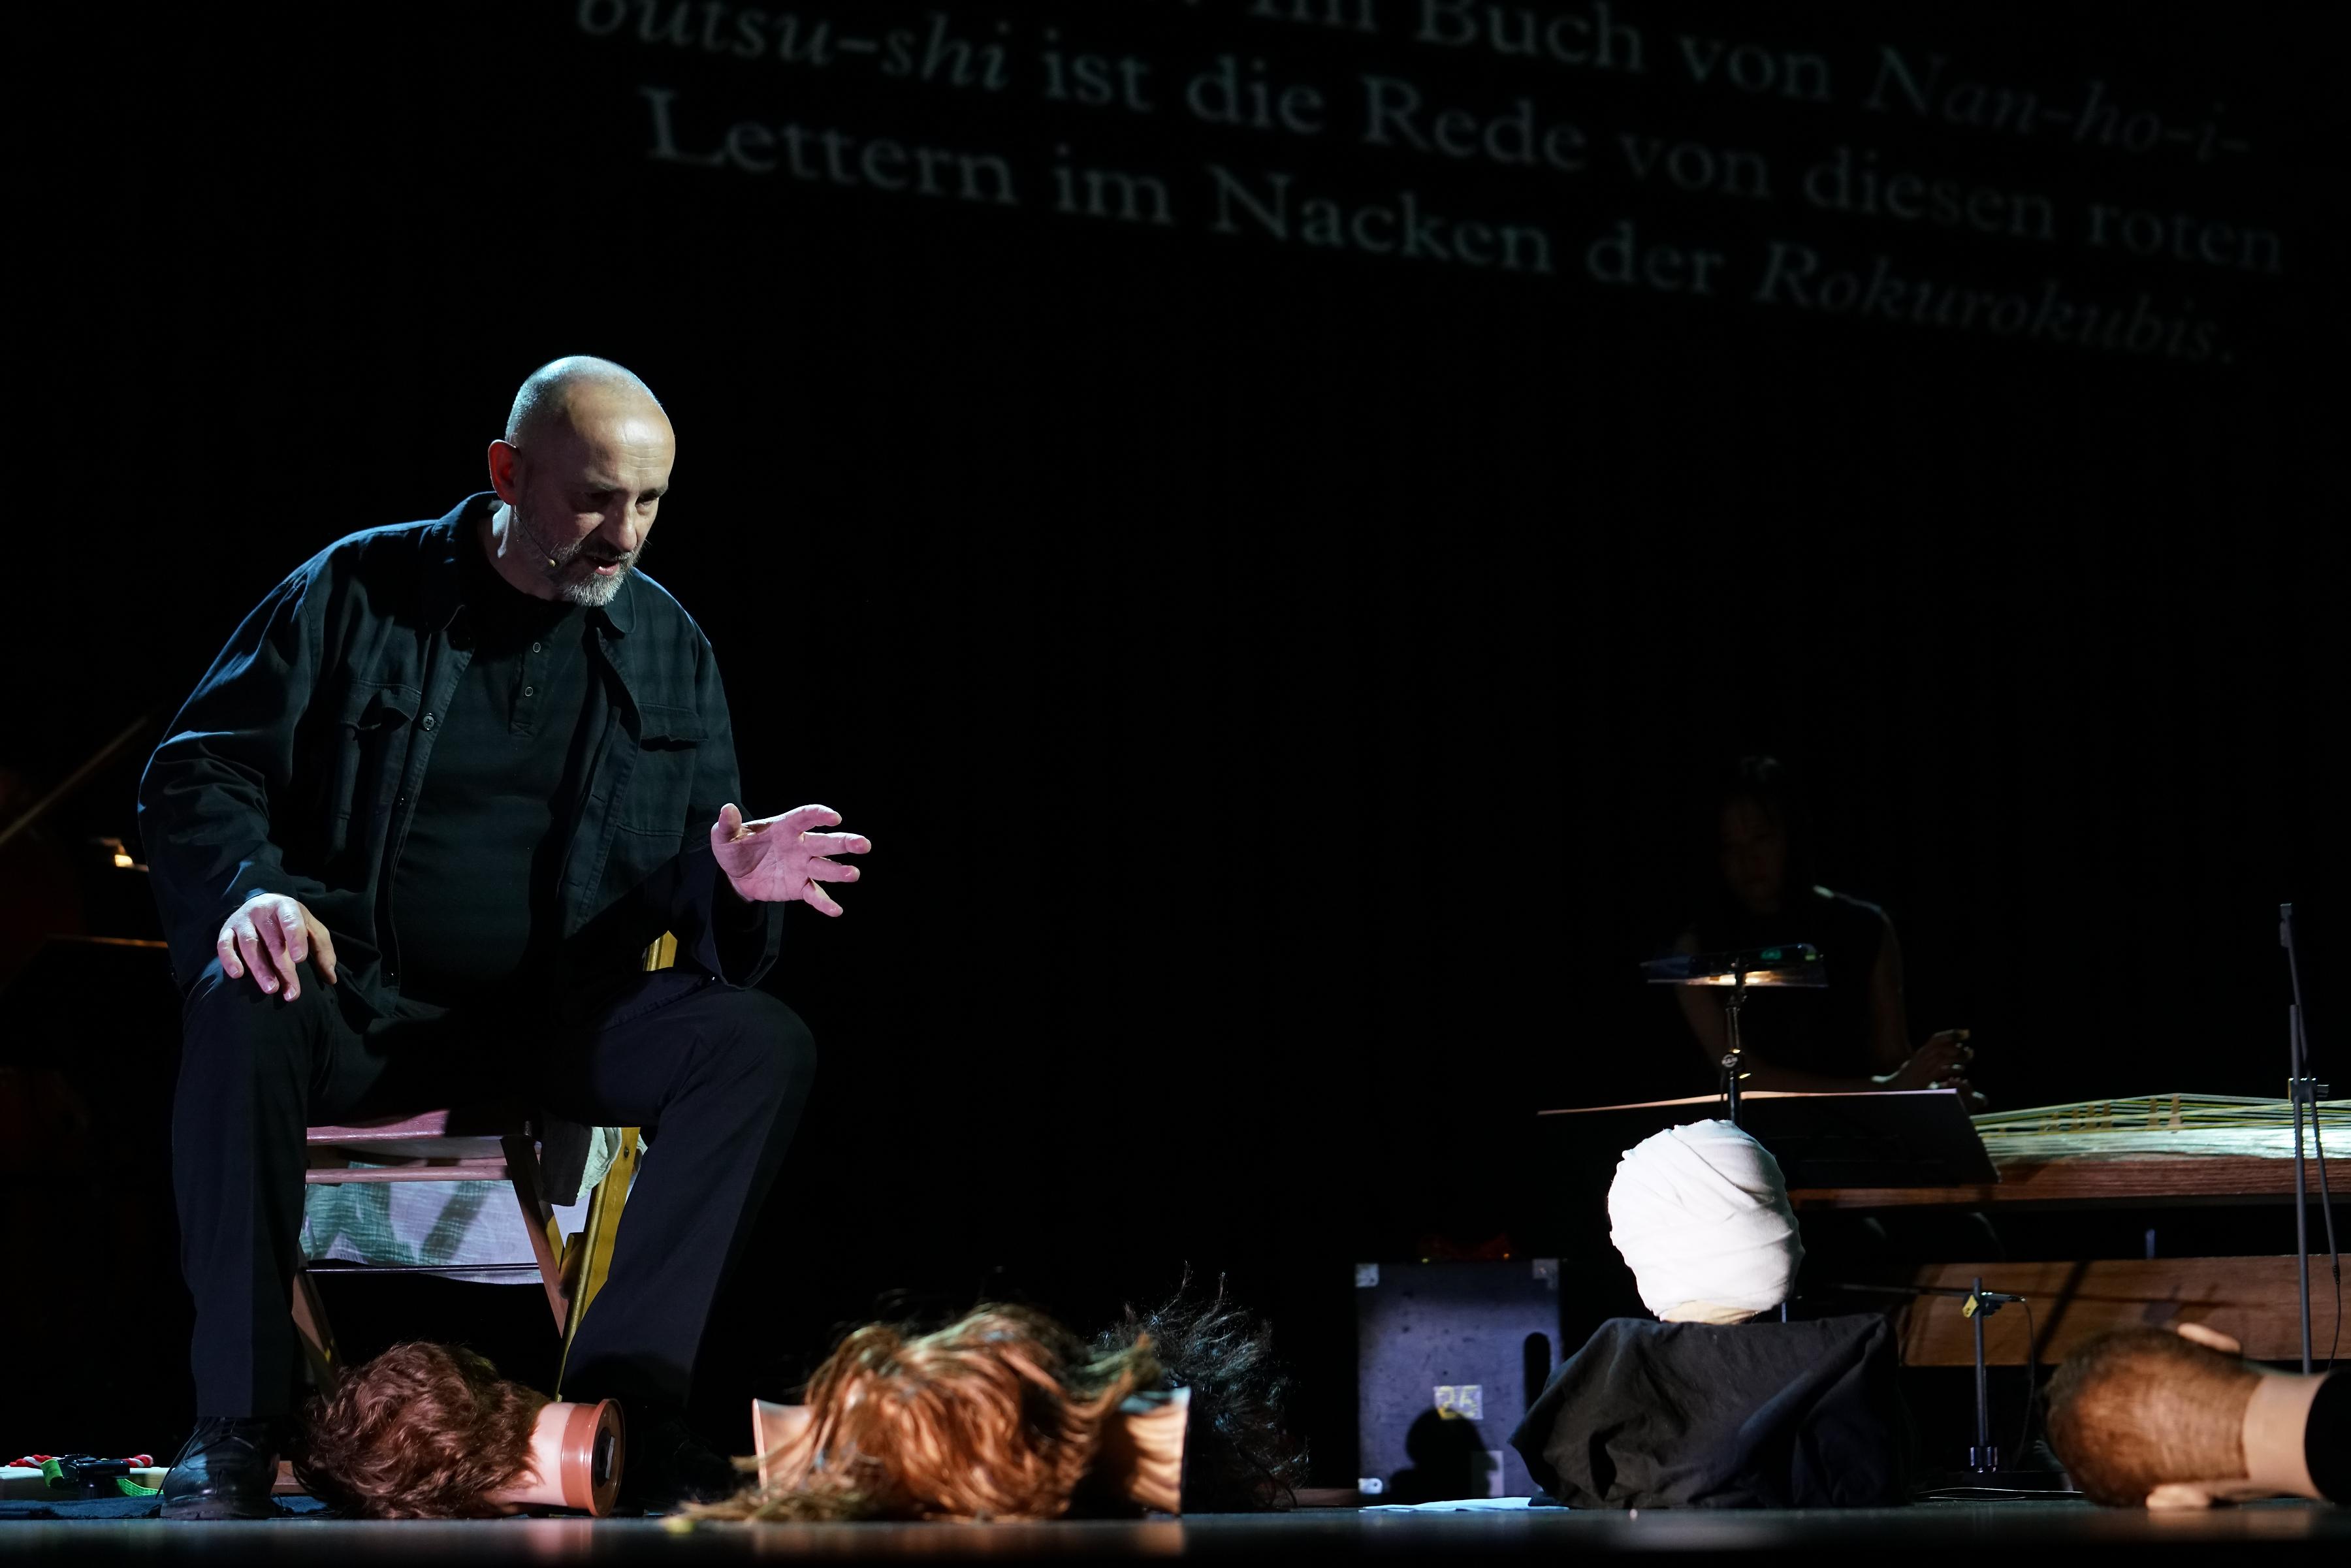 Ensemble Musikfabrik, Misato Mochizuki/Ttes fŸr Rezitator und Ensemble, Rezitator Paul-Alexandre Dubois, Dirigent Anno Poppe